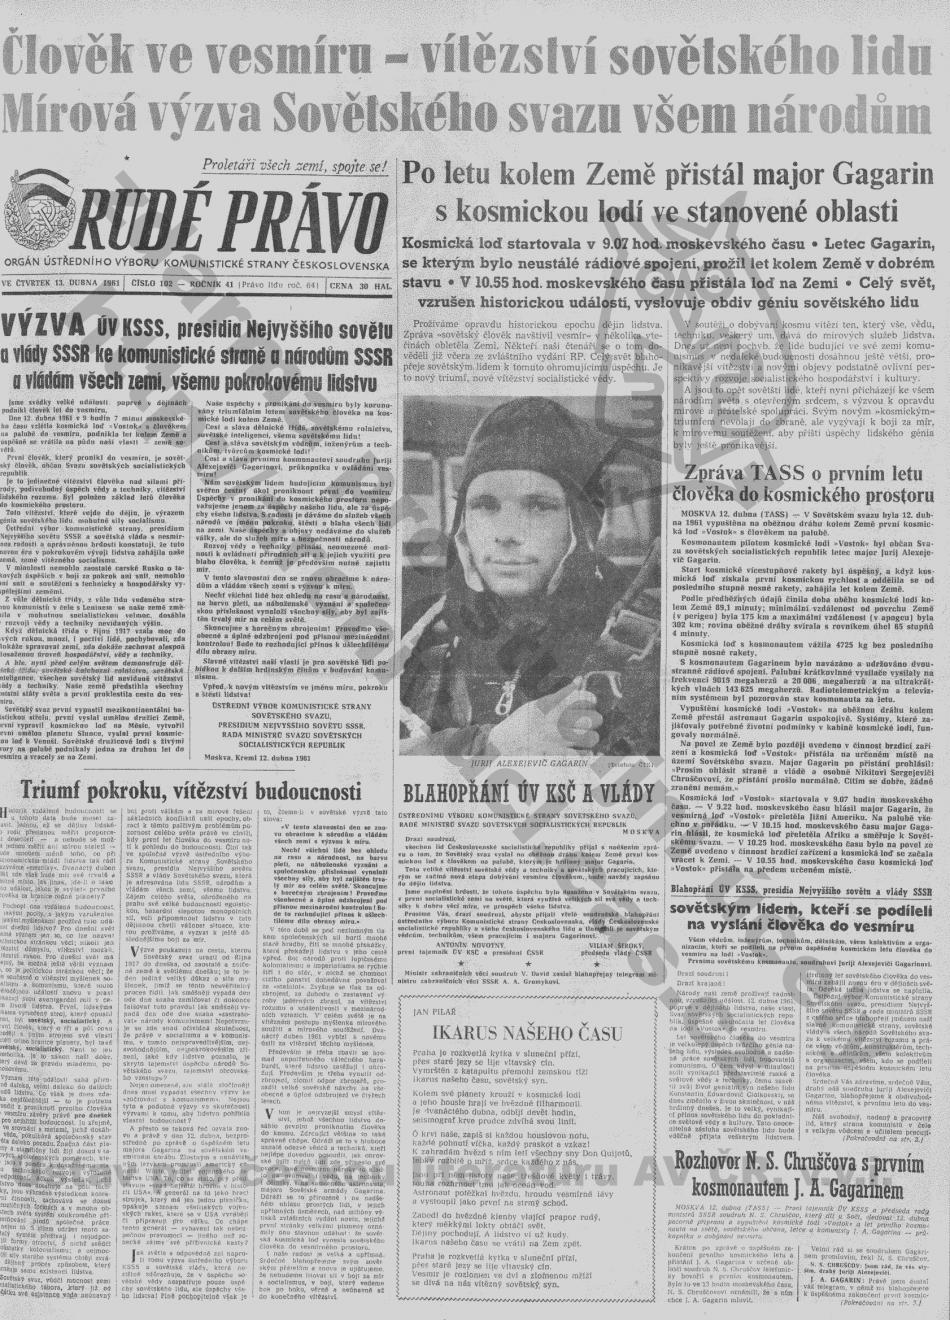 Titulní strana Rudého práva věnovaná Gagarinovu letu do vesmíru (číslo 102, ročník 41)